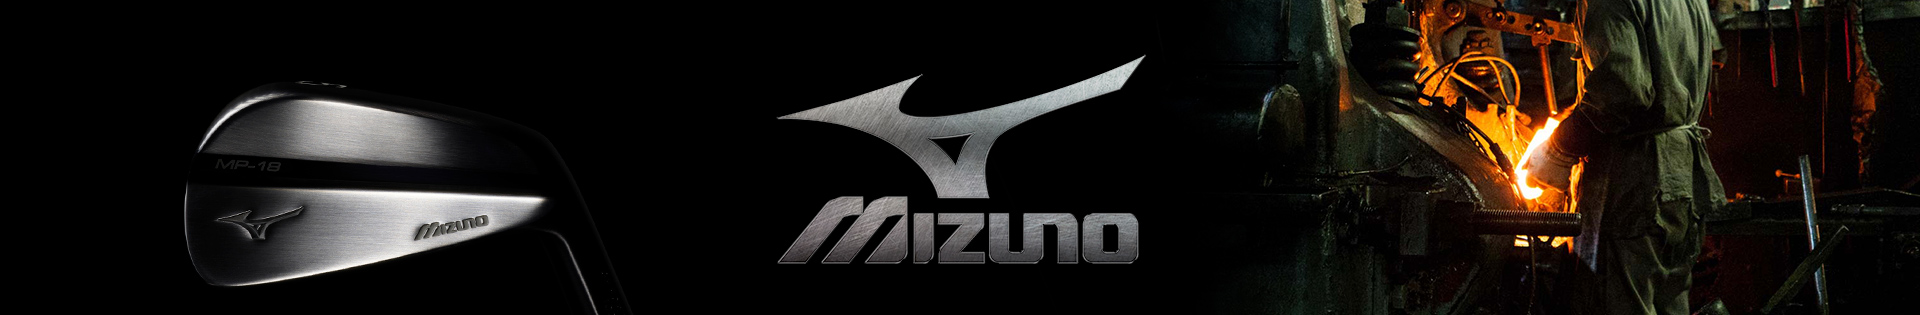 Mizuno Golfudstyr